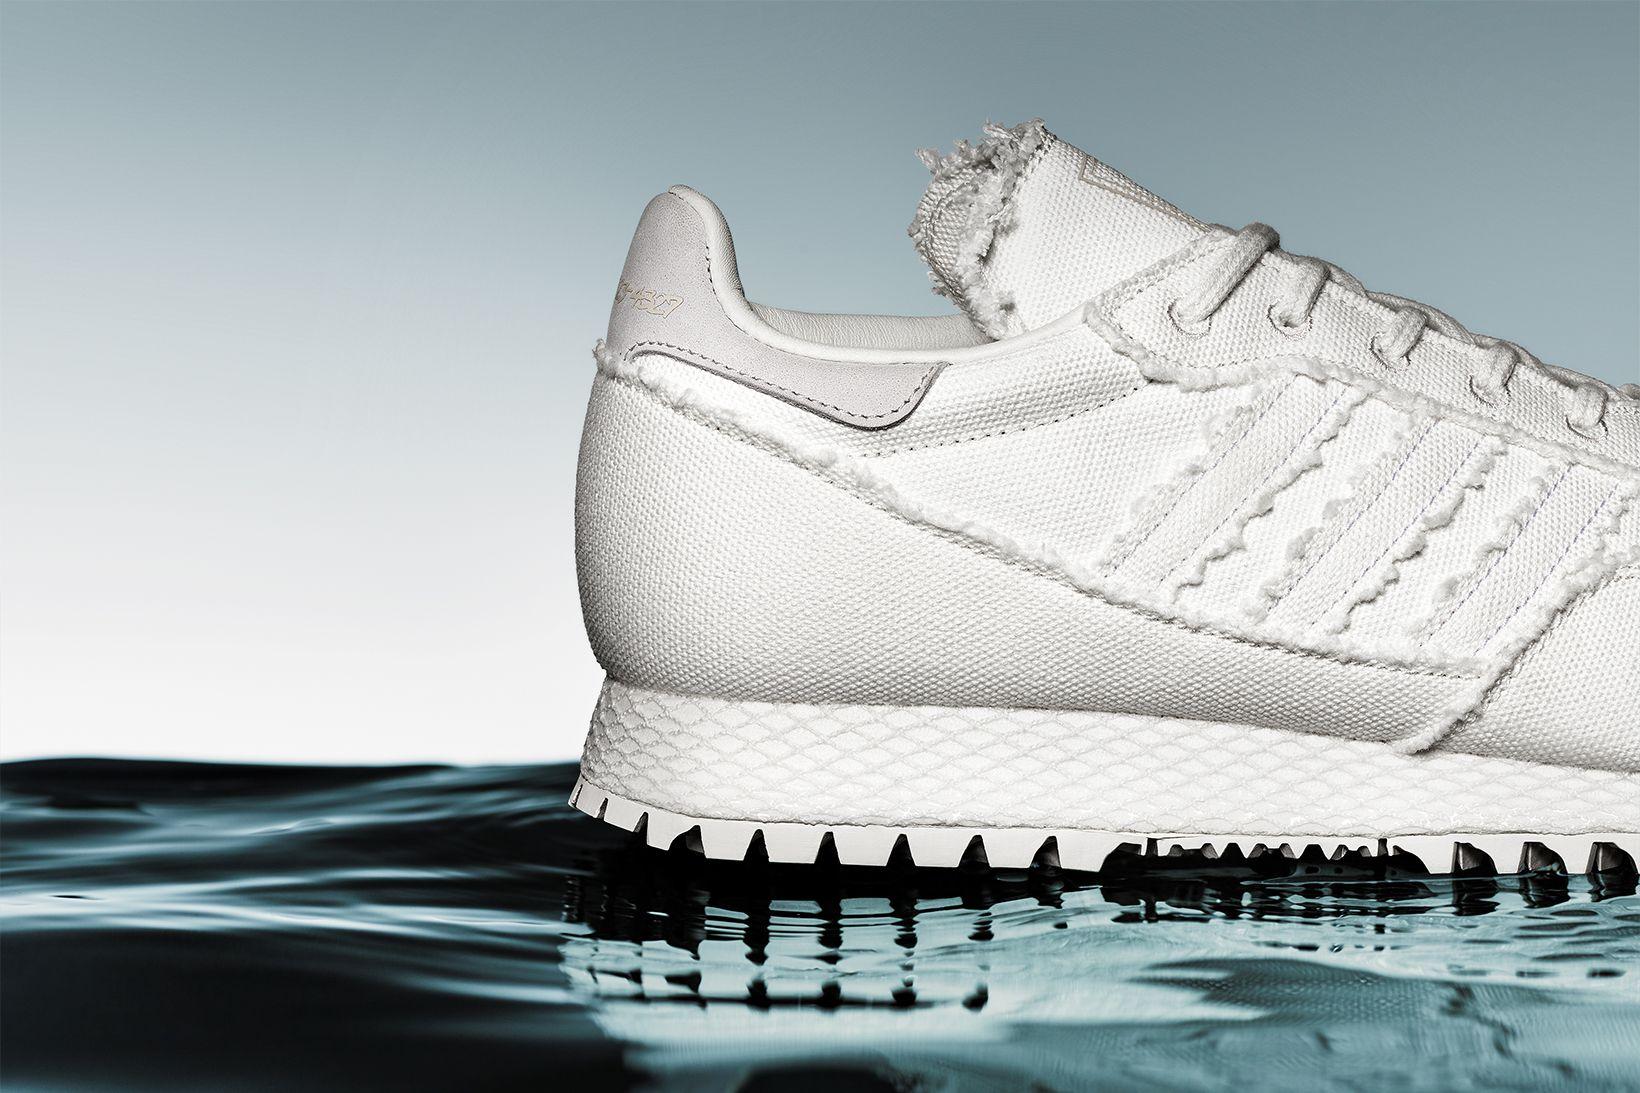 Daniel Arsham's adidas Originals New York's Collaboration